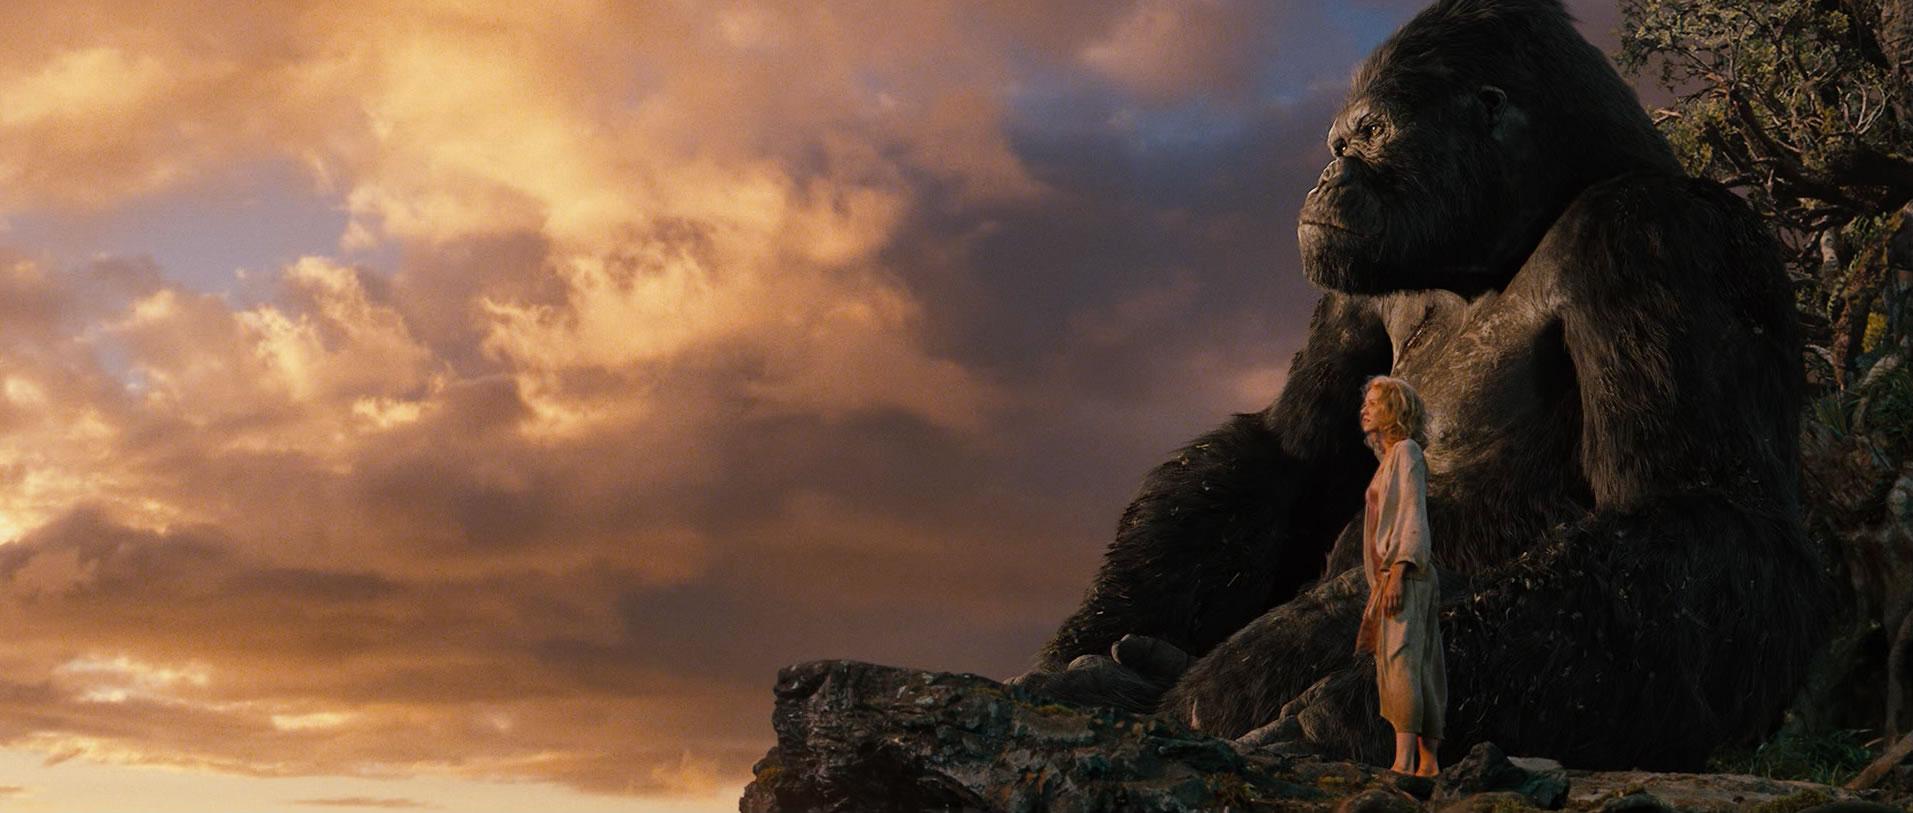 Naomi Watts dans King Kong de Peter Jackson (2005)